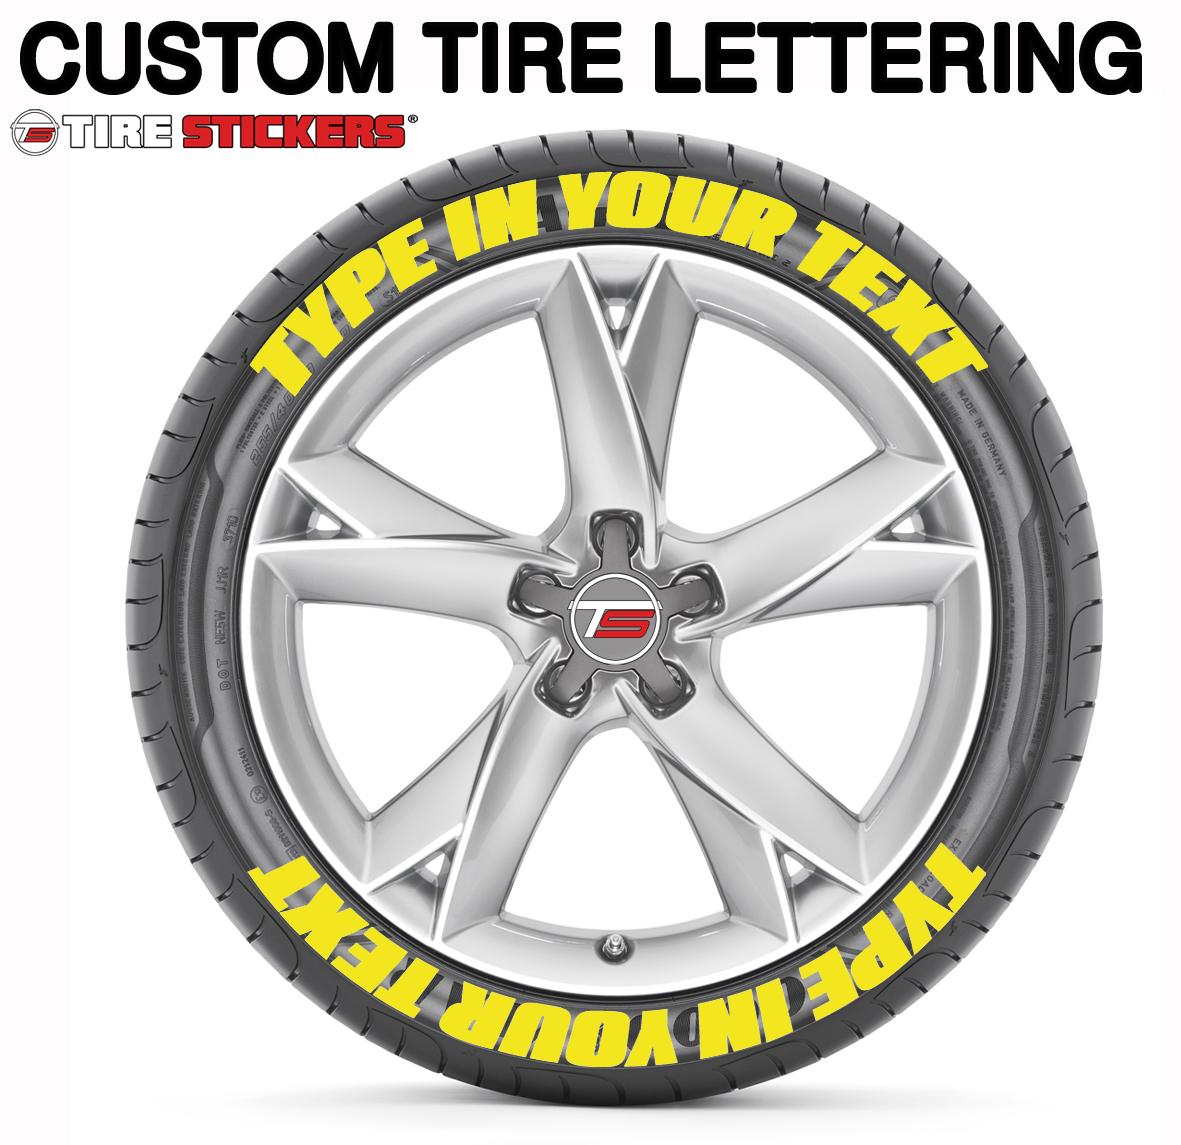 Custom tire lettering amazon yellow